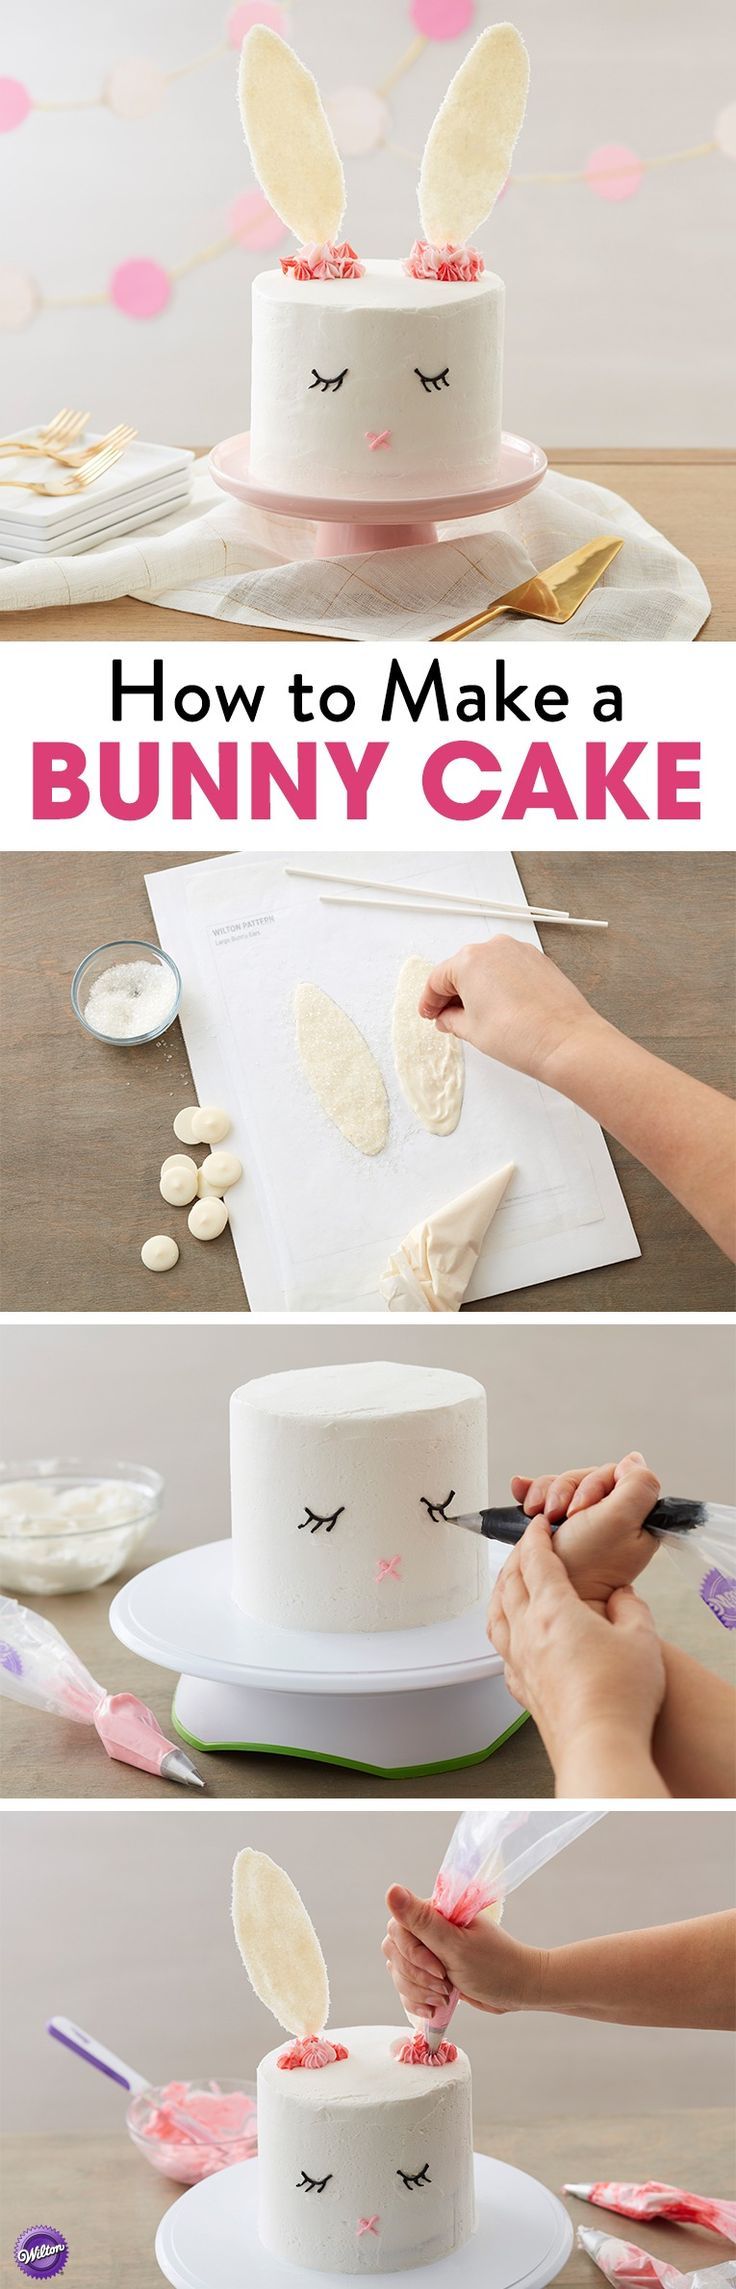 Original torta para celebración de Baby shower. #babyshower #tarta #pastel